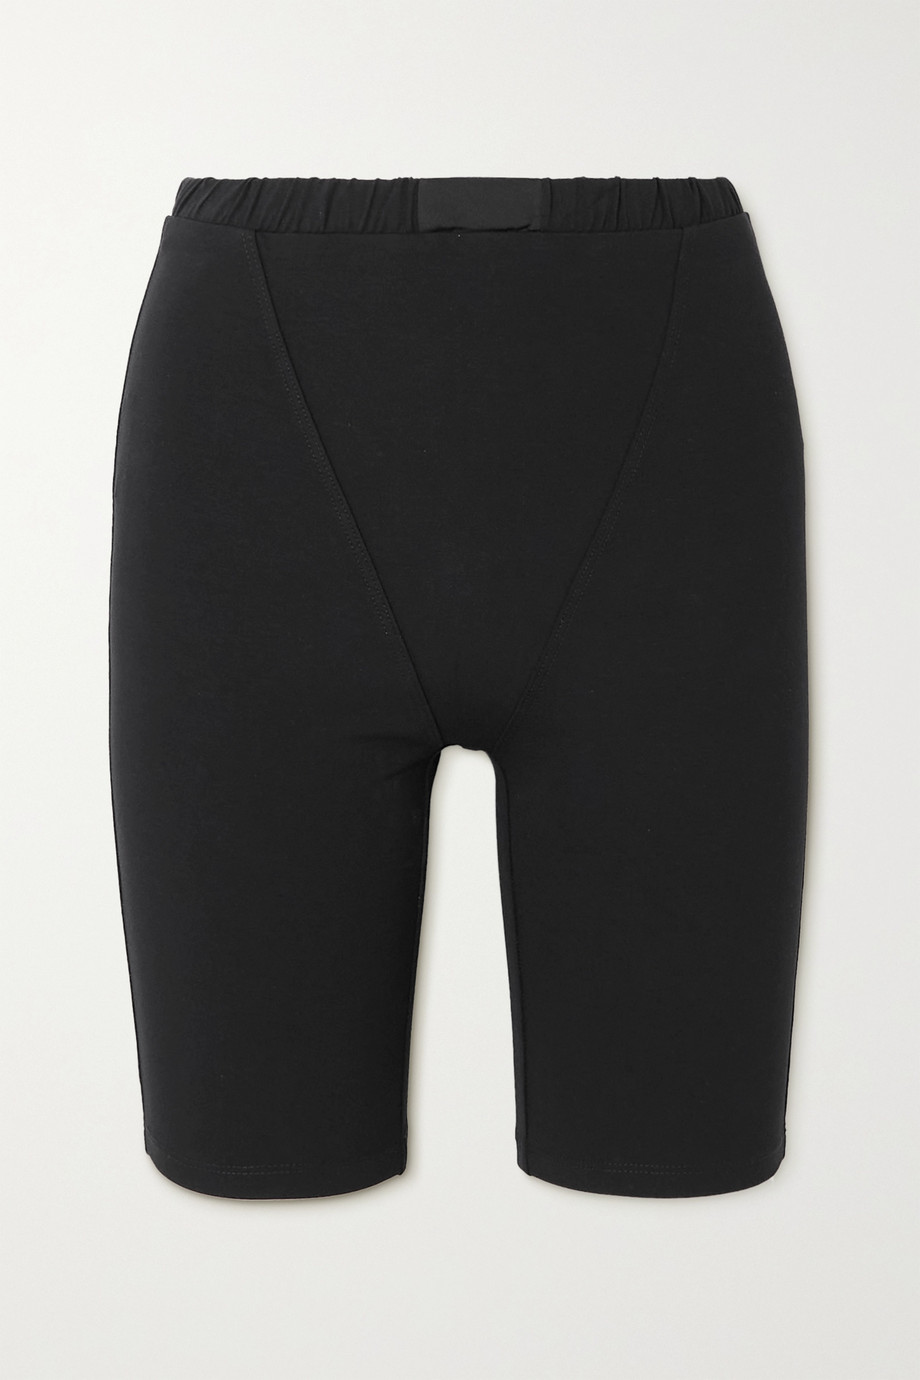 Marika Vera Gallant stretch bamboo and organic cotton-blend shorts